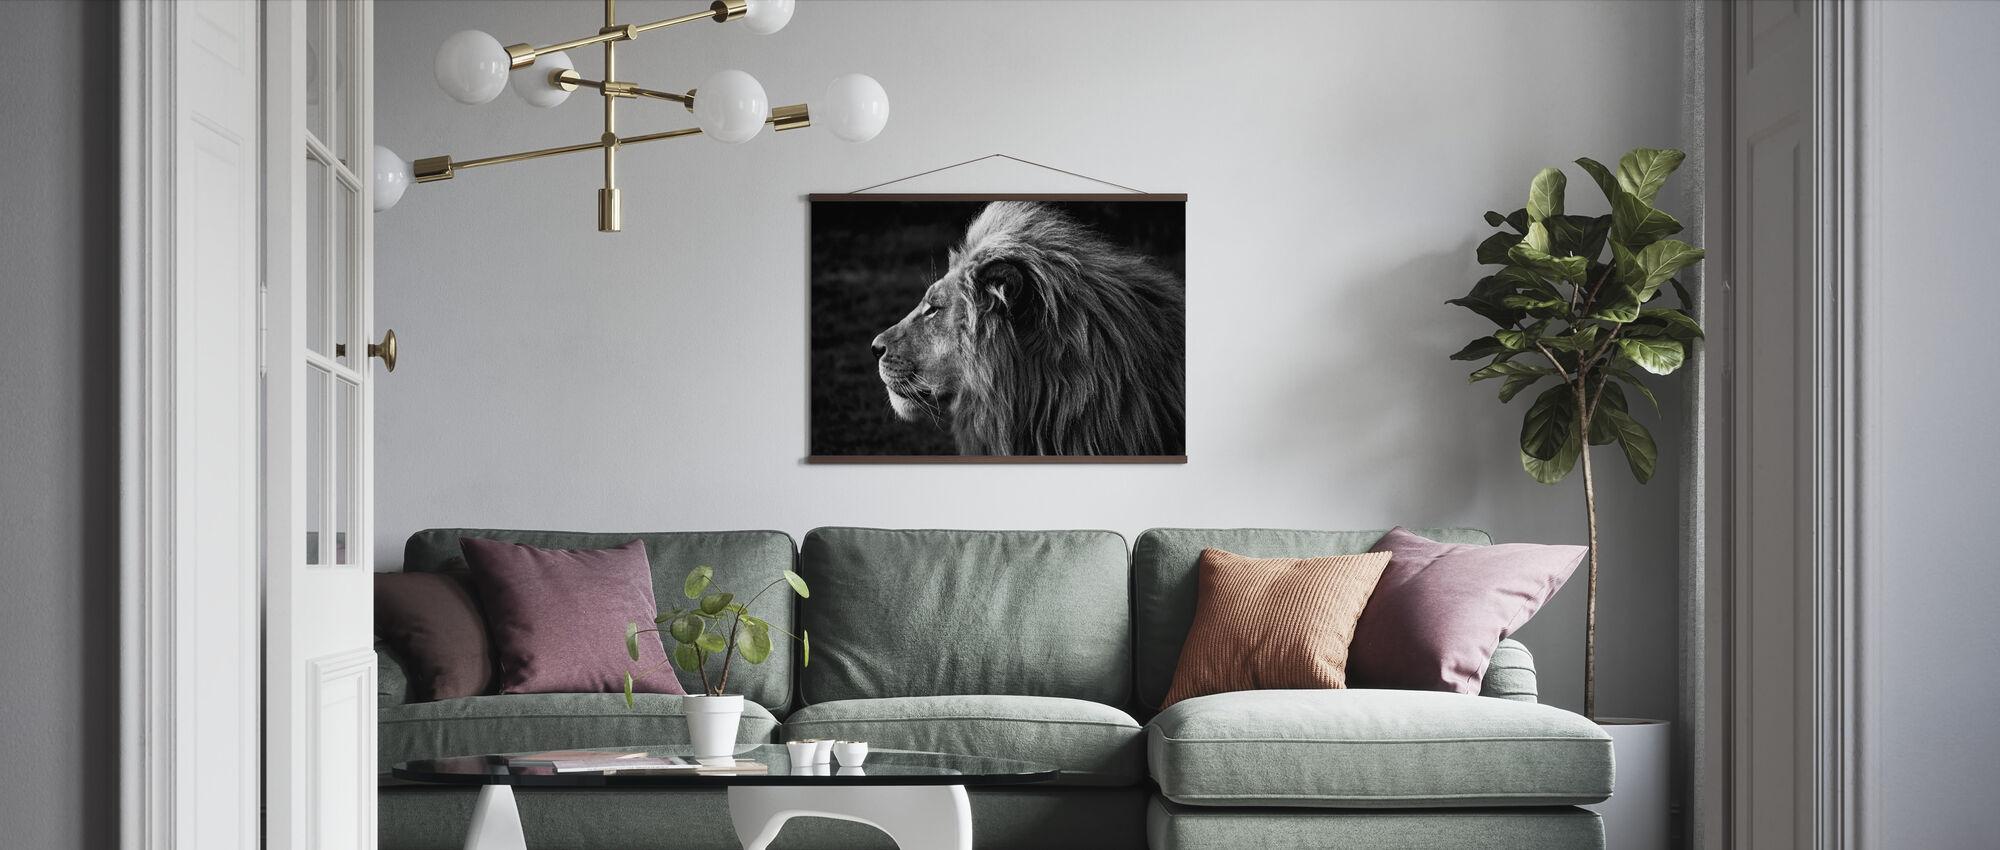 Løve - Plakat - Stue